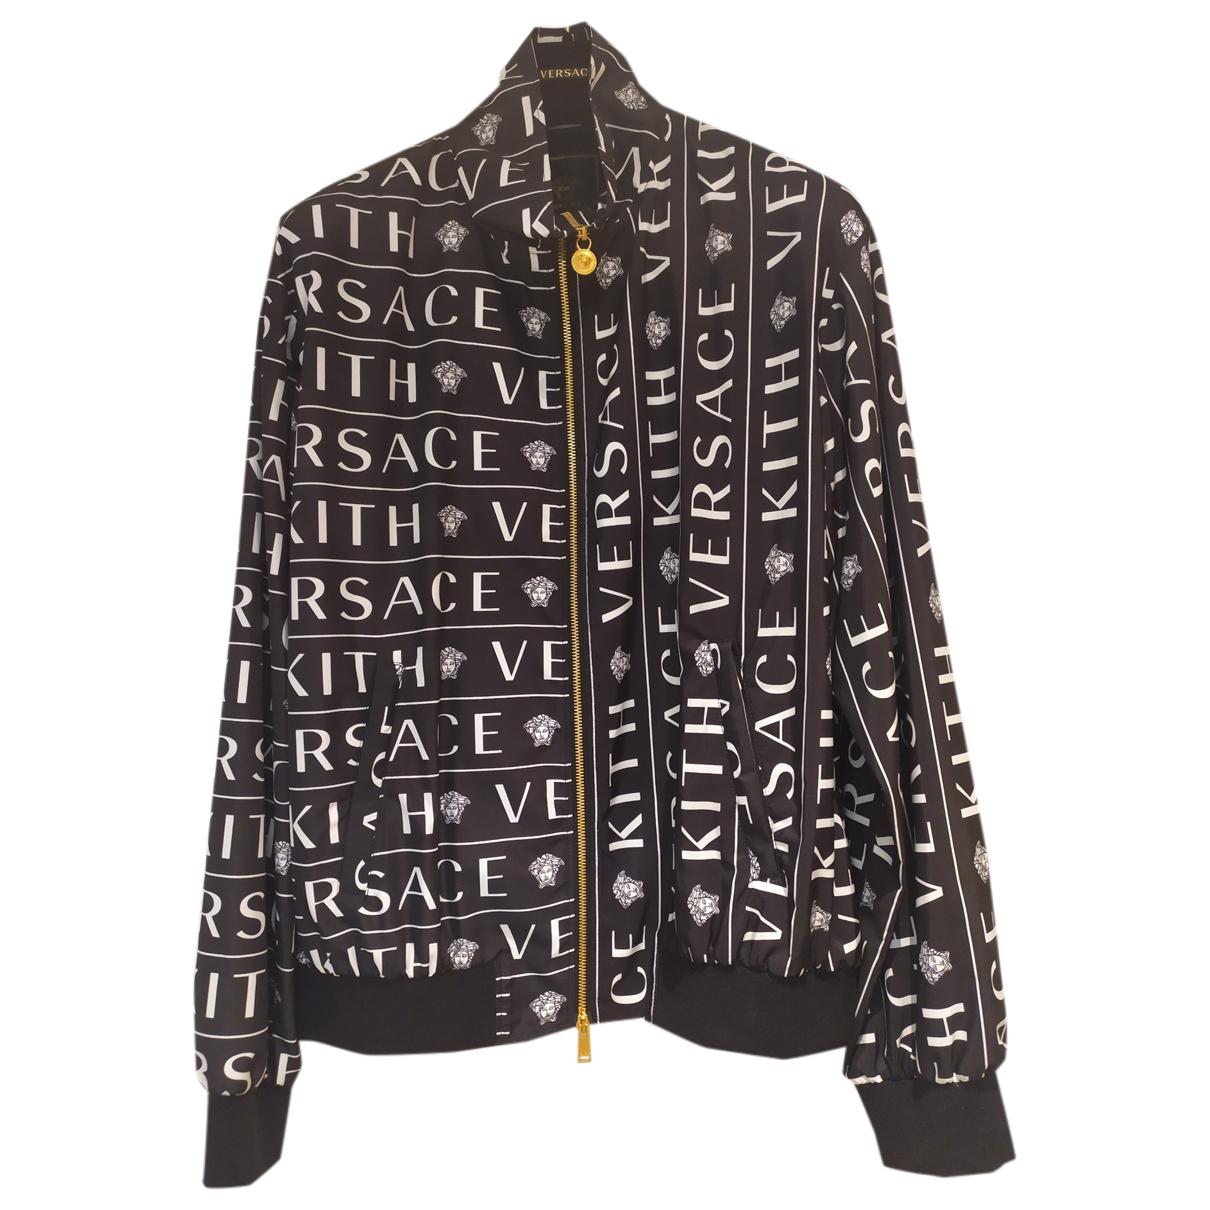 Versace X Kith \N Jacke in  Schwarz Synthetik